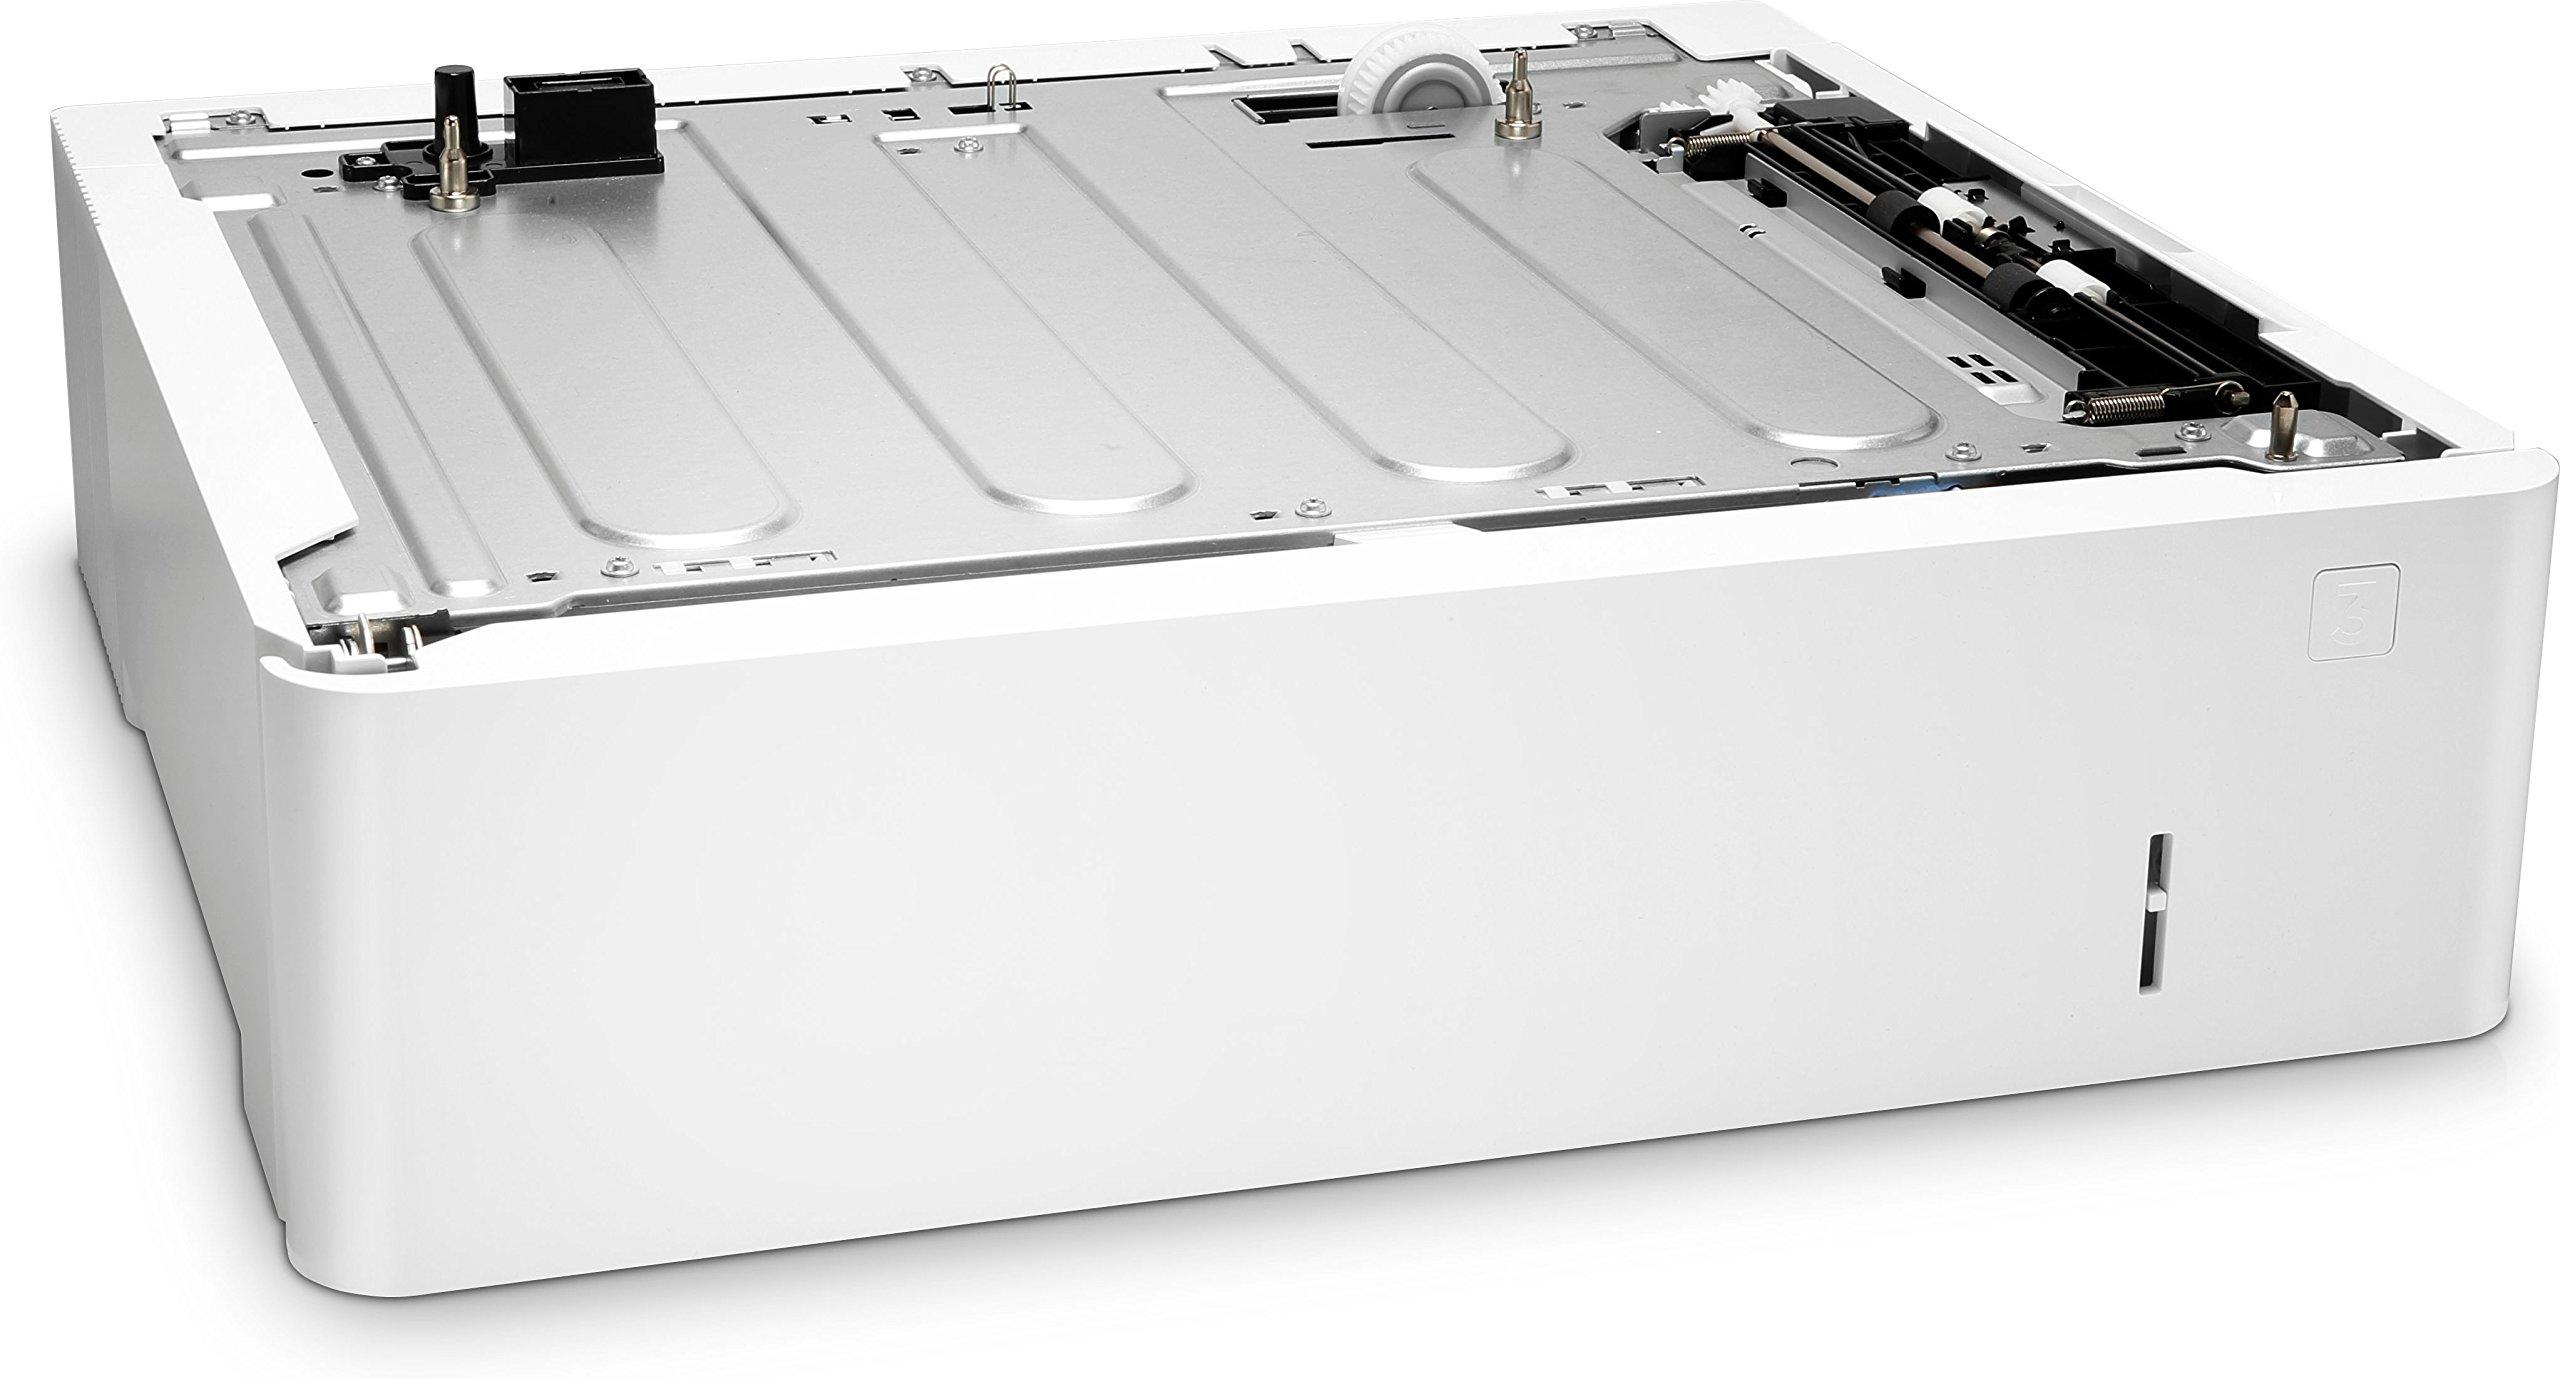 HP L0H21A Envelope Feeder - 75 Sheets in 1 Tray(s) - for Laserjet Enterprise M607, M608, M609, Laserjet Managed E60055, E60065, E60075